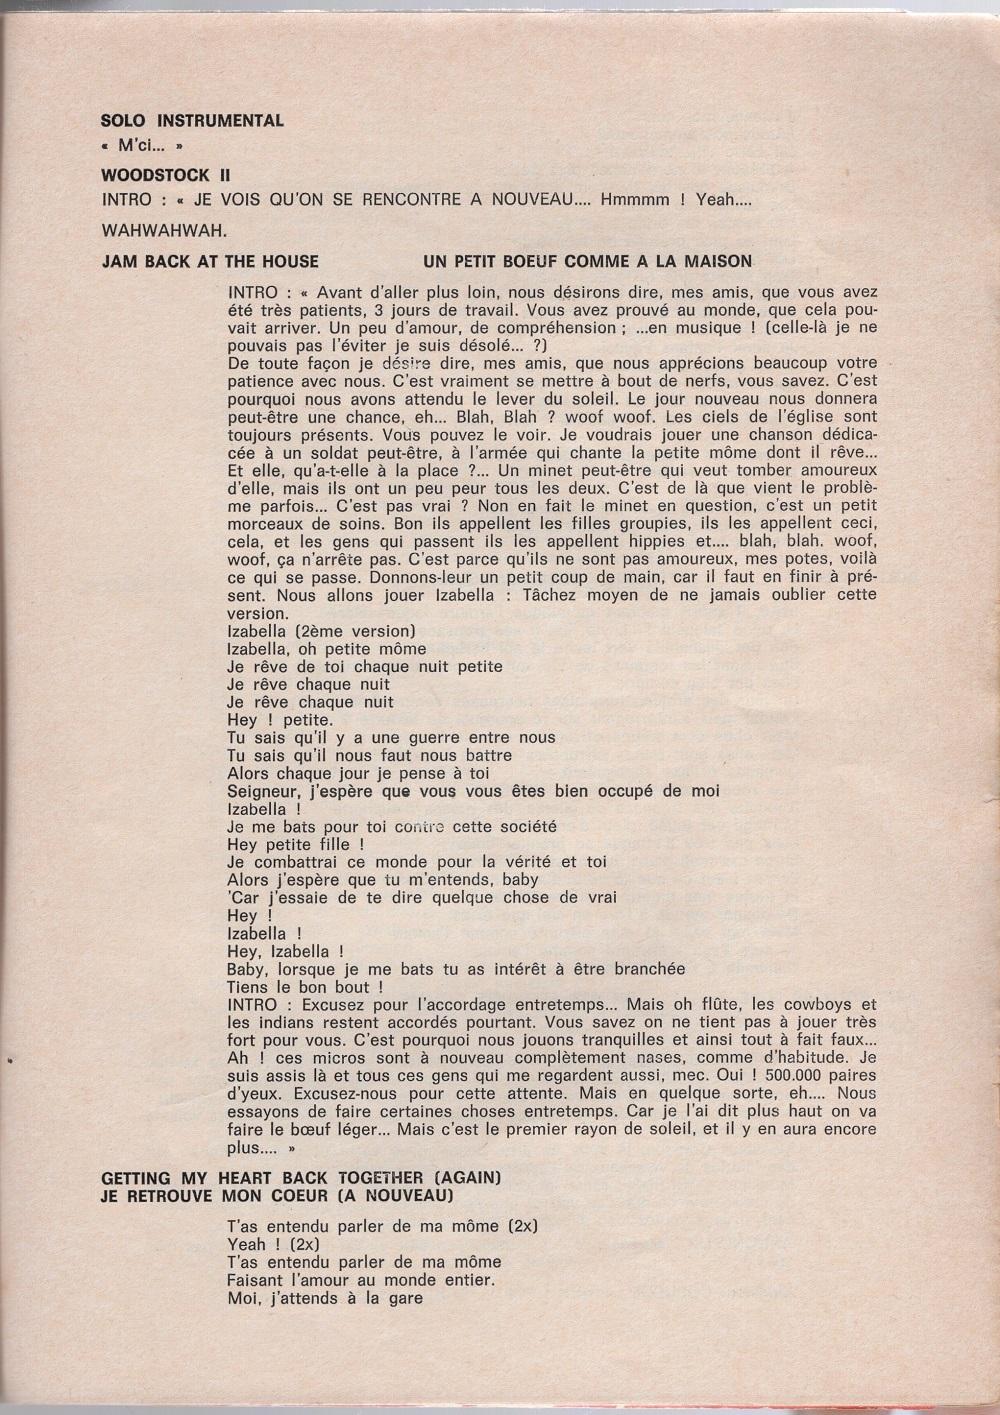 Curio Francais... Jimi Hendrix Songbook - Page 2 6610